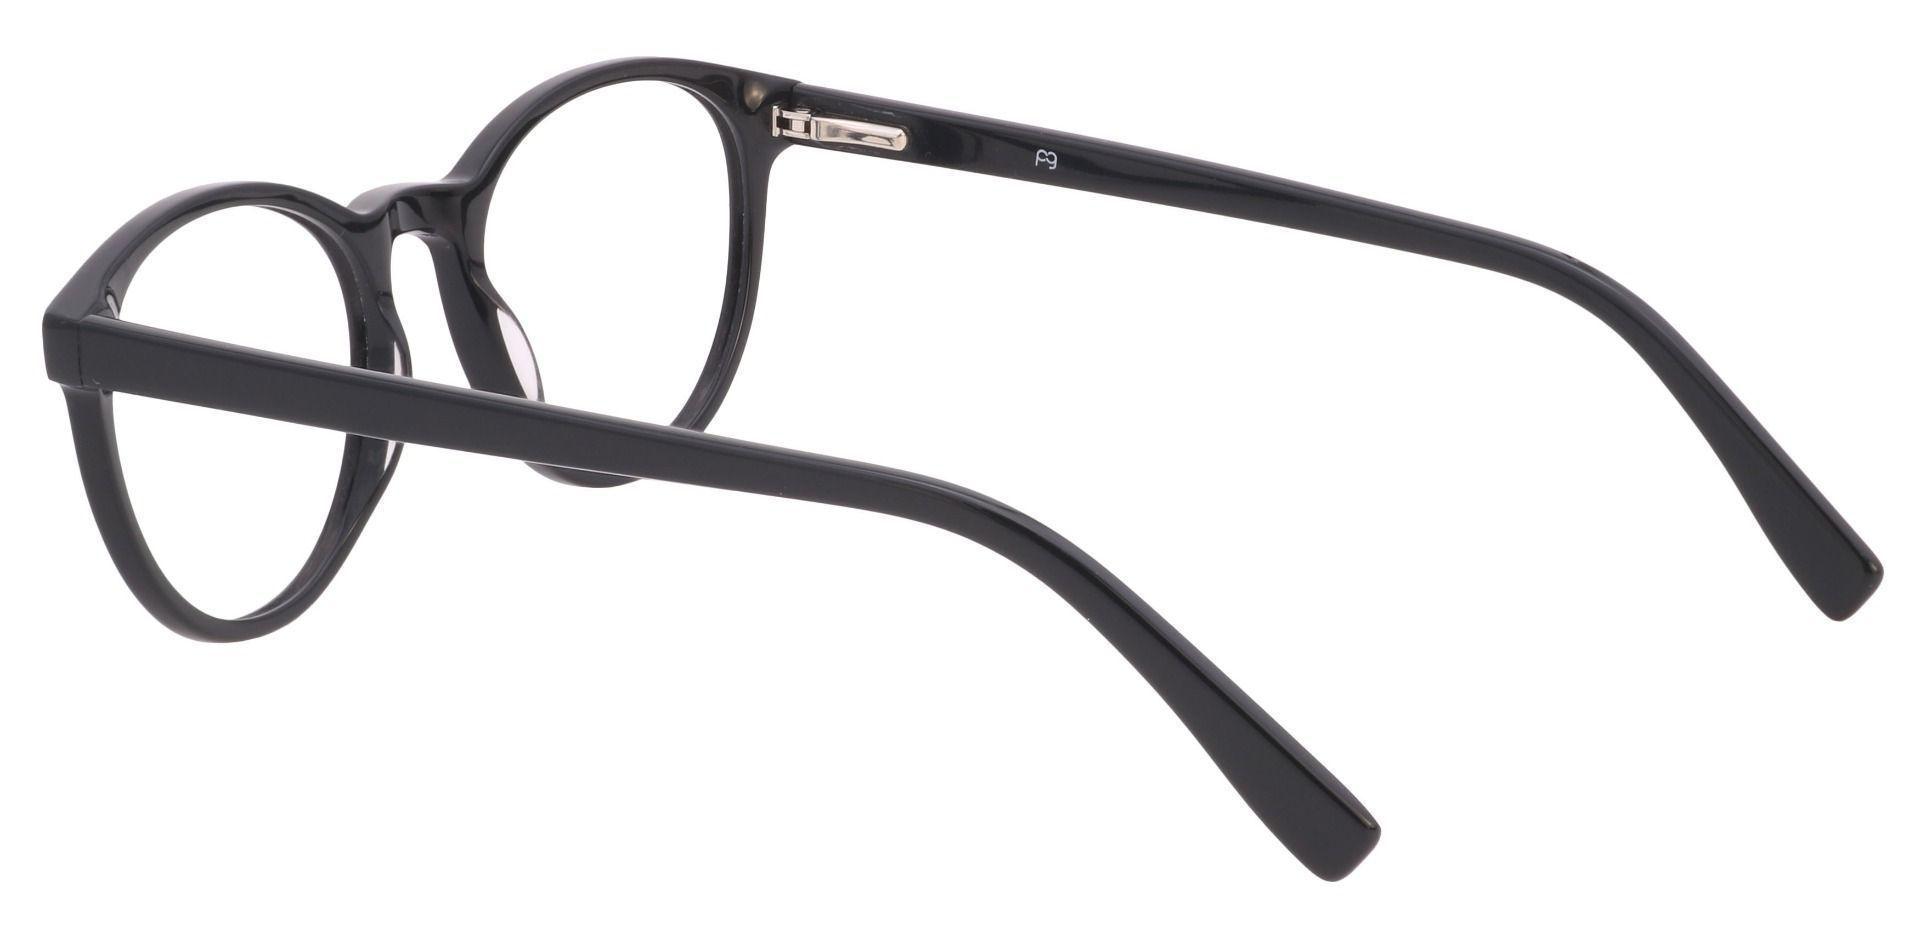 Stellar Oval Prescription Glasses - Black